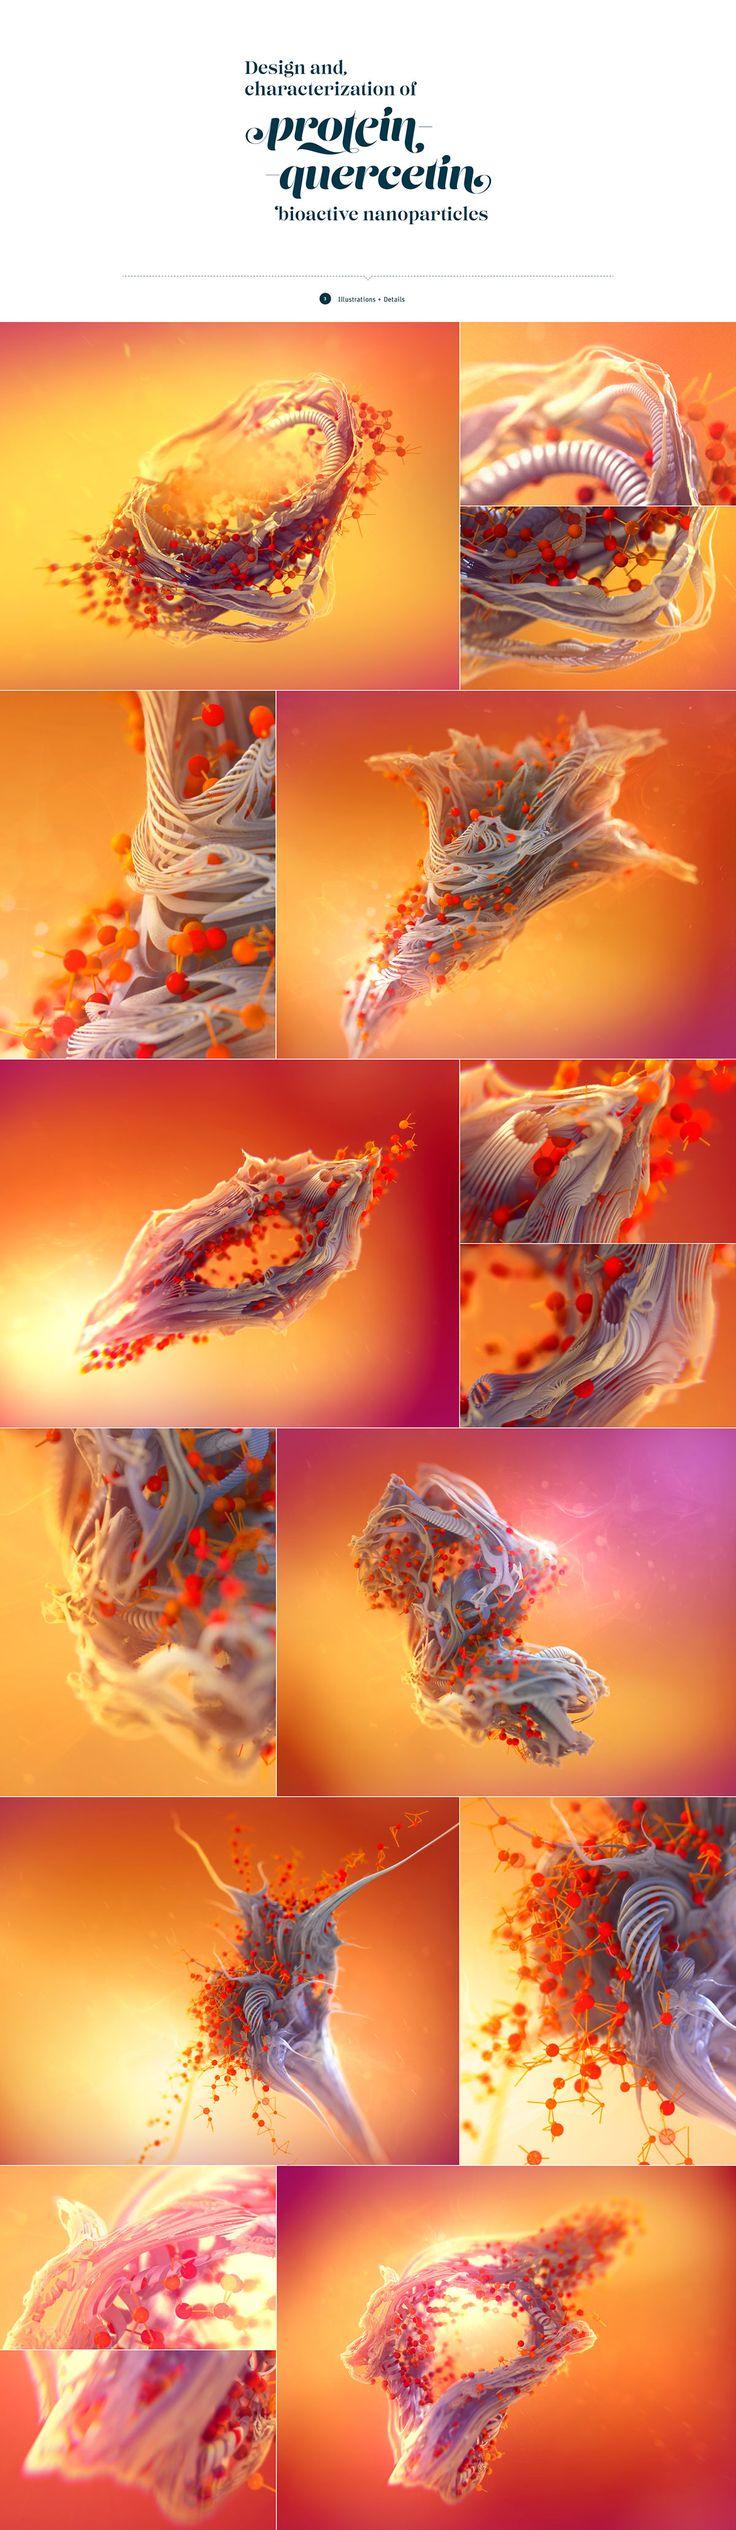 Science report Protein Quercetin with fractal illustrations #fractal #prints #brochure #illustration